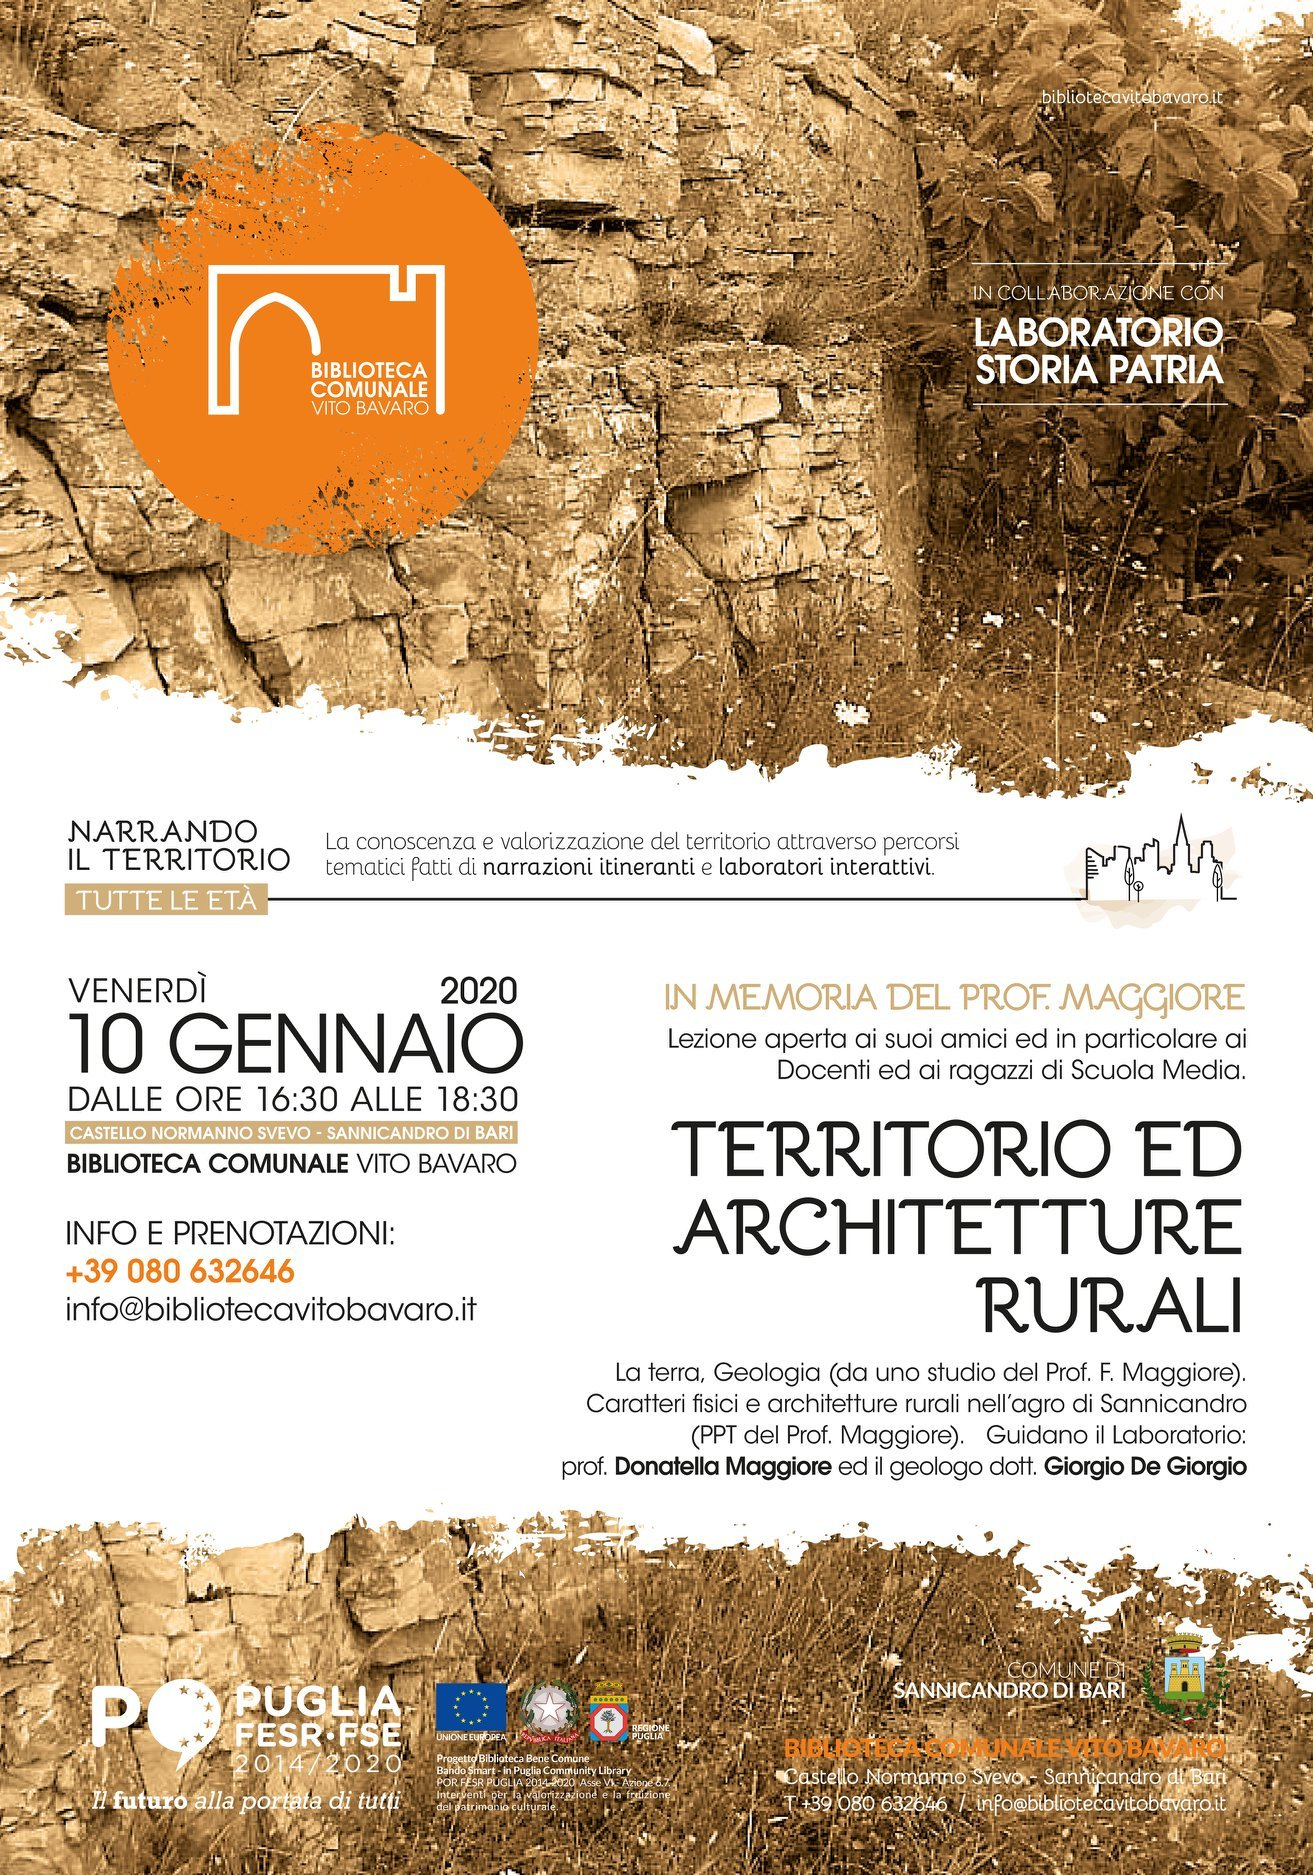 Territorio ed architetture rurali